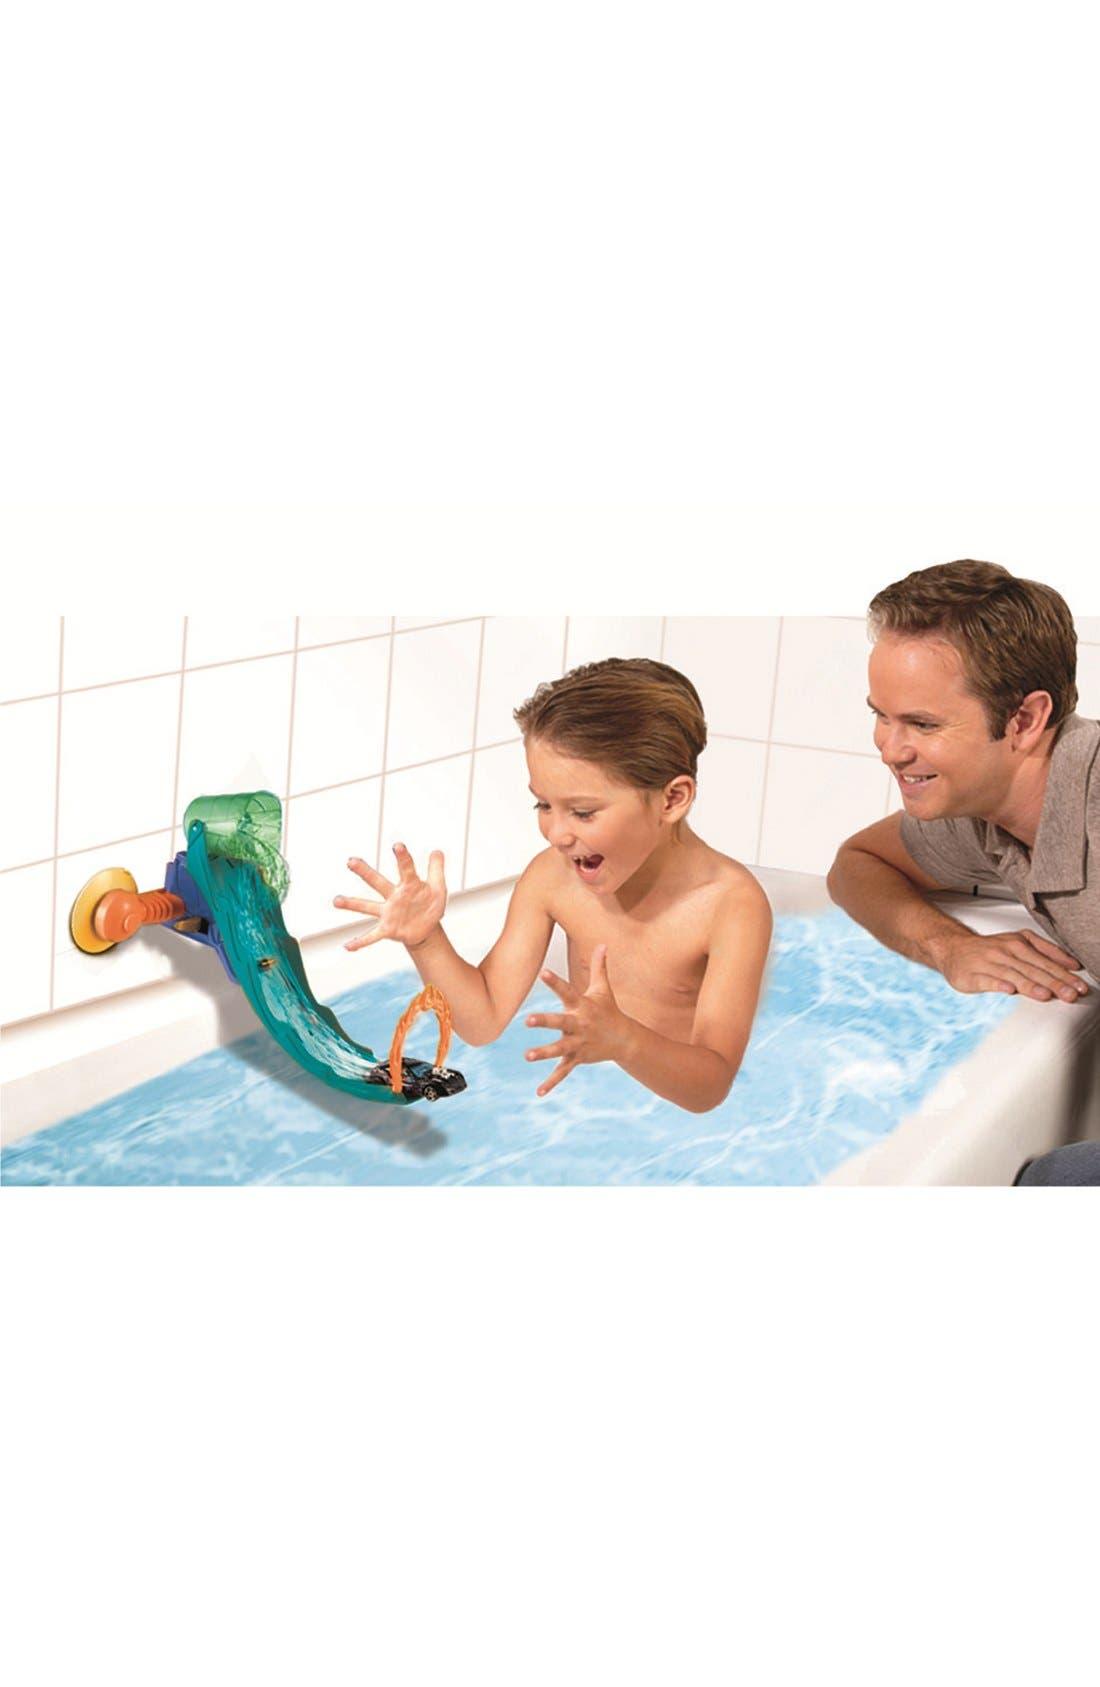 MATTEL,                             'Hot Wheels<sup>®</sup> - Splash Track<sup>™</sup>' Tub Track Set,                             Alternate thumbnail 6, color,                             400